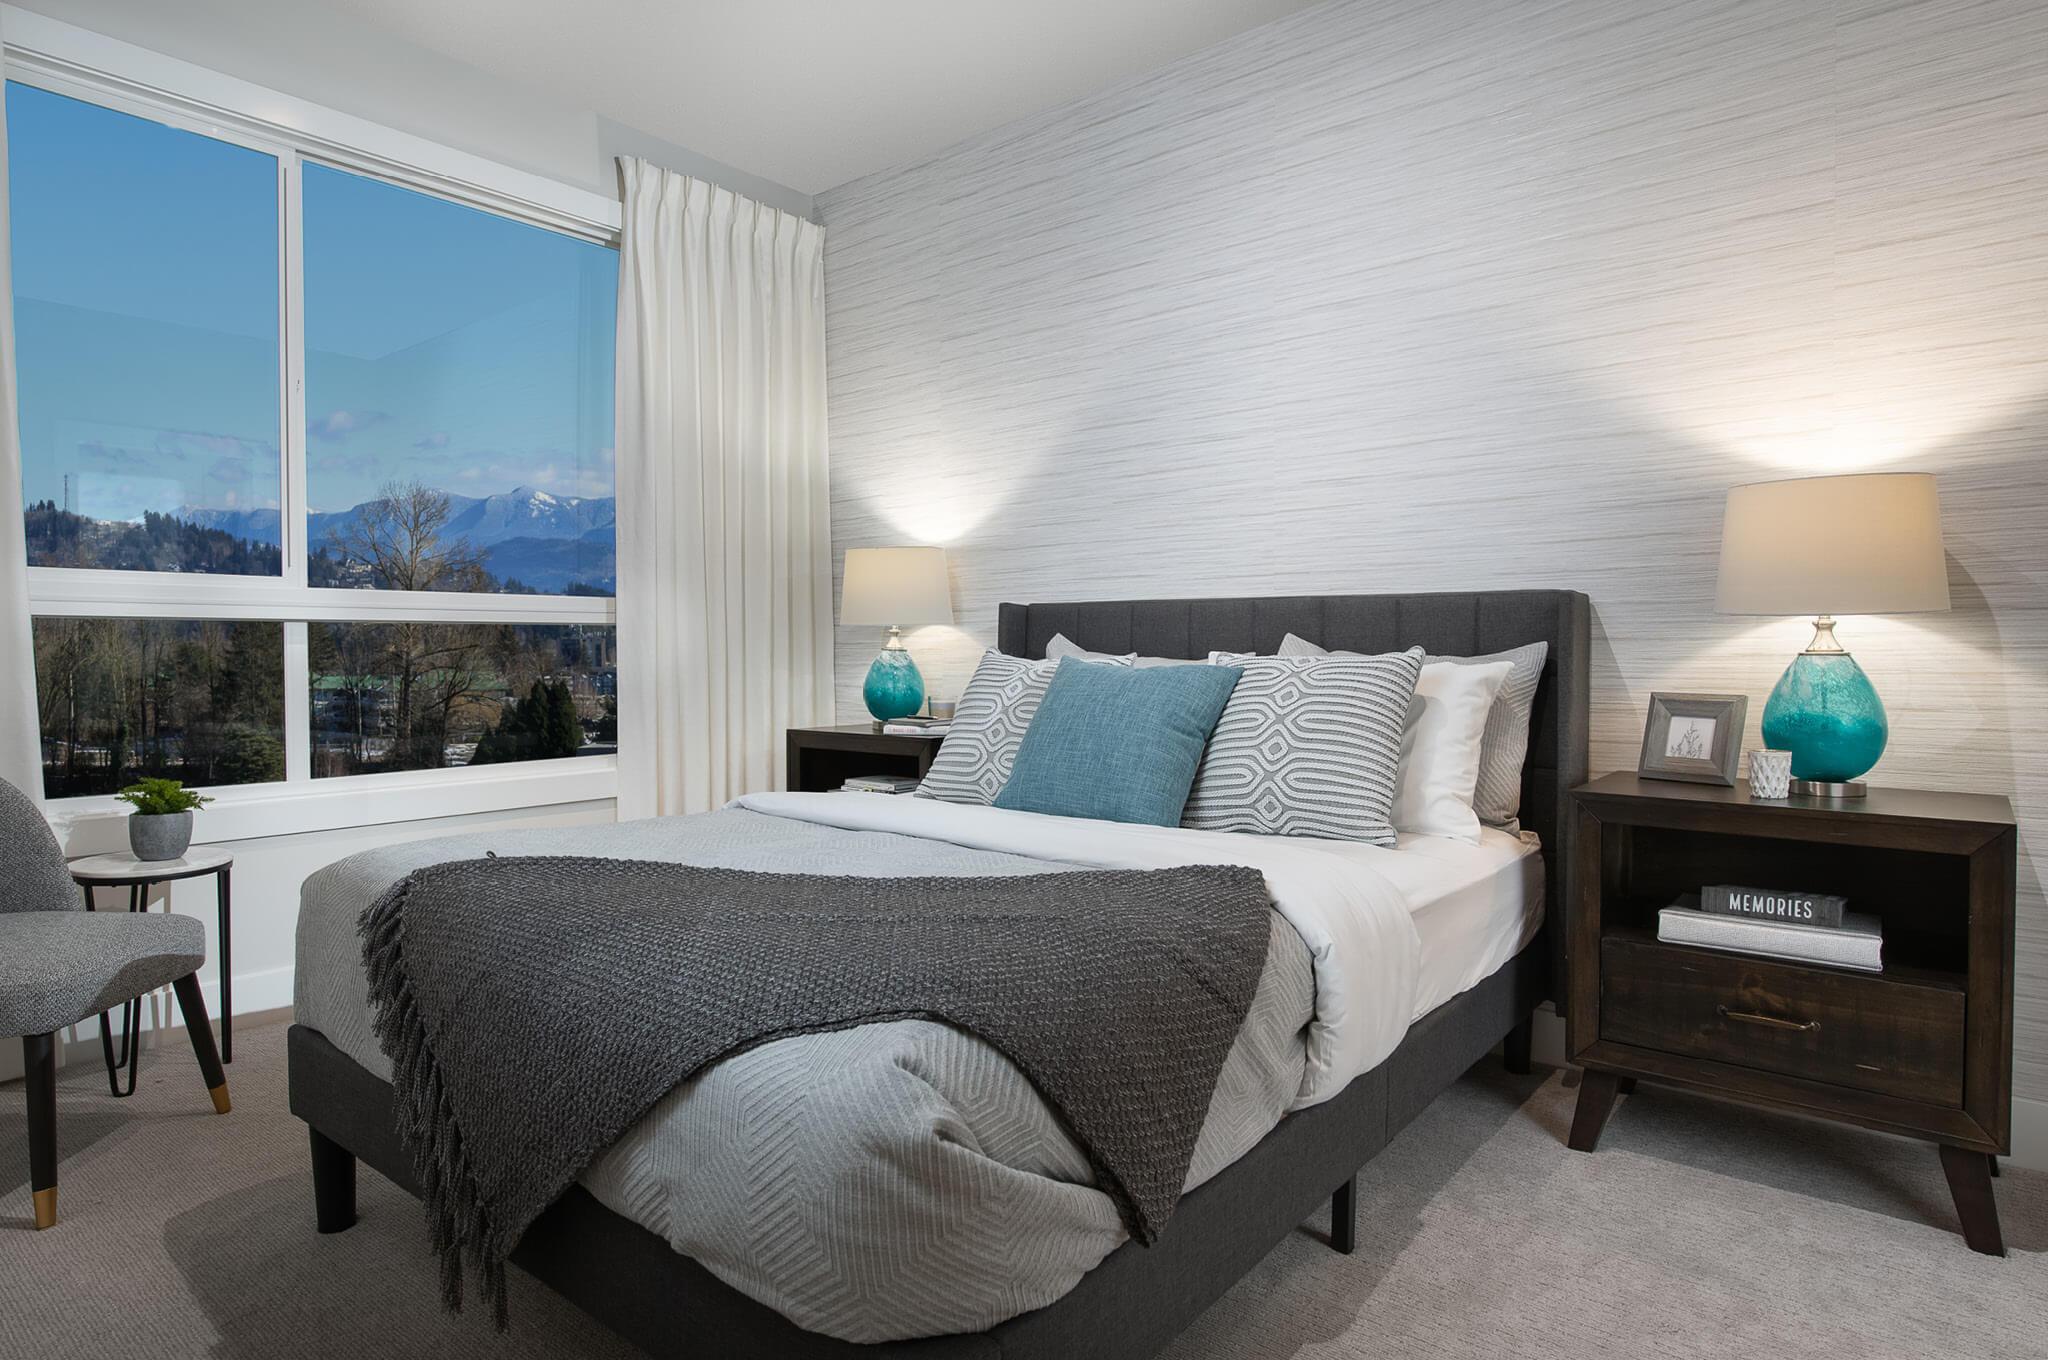 Bedroom - 32838 Ventura Ave, Abbotsford, BC V2S 6J3, Canada!